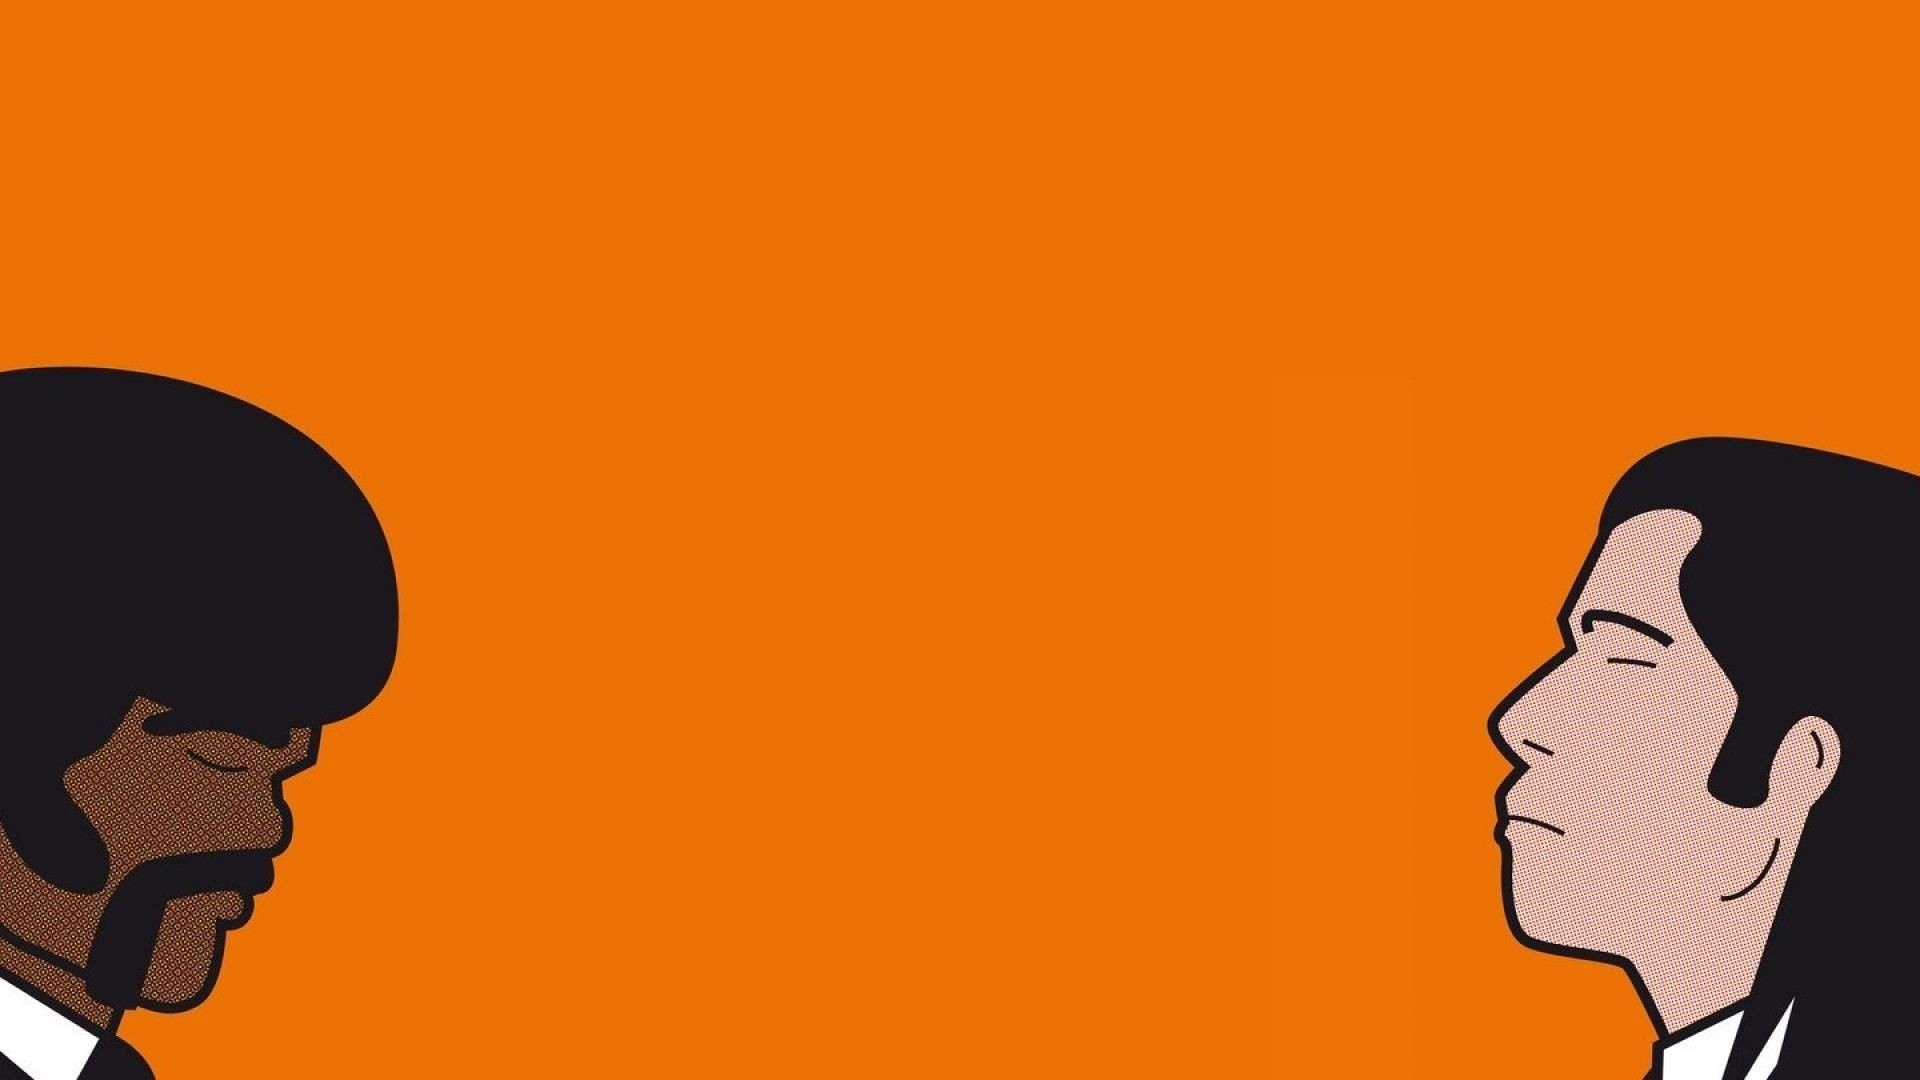 Download a Pulp Fiction Pulp Fiction Walking Dead Crossover HD Pleasing  Wallpaper Free 1920×1080